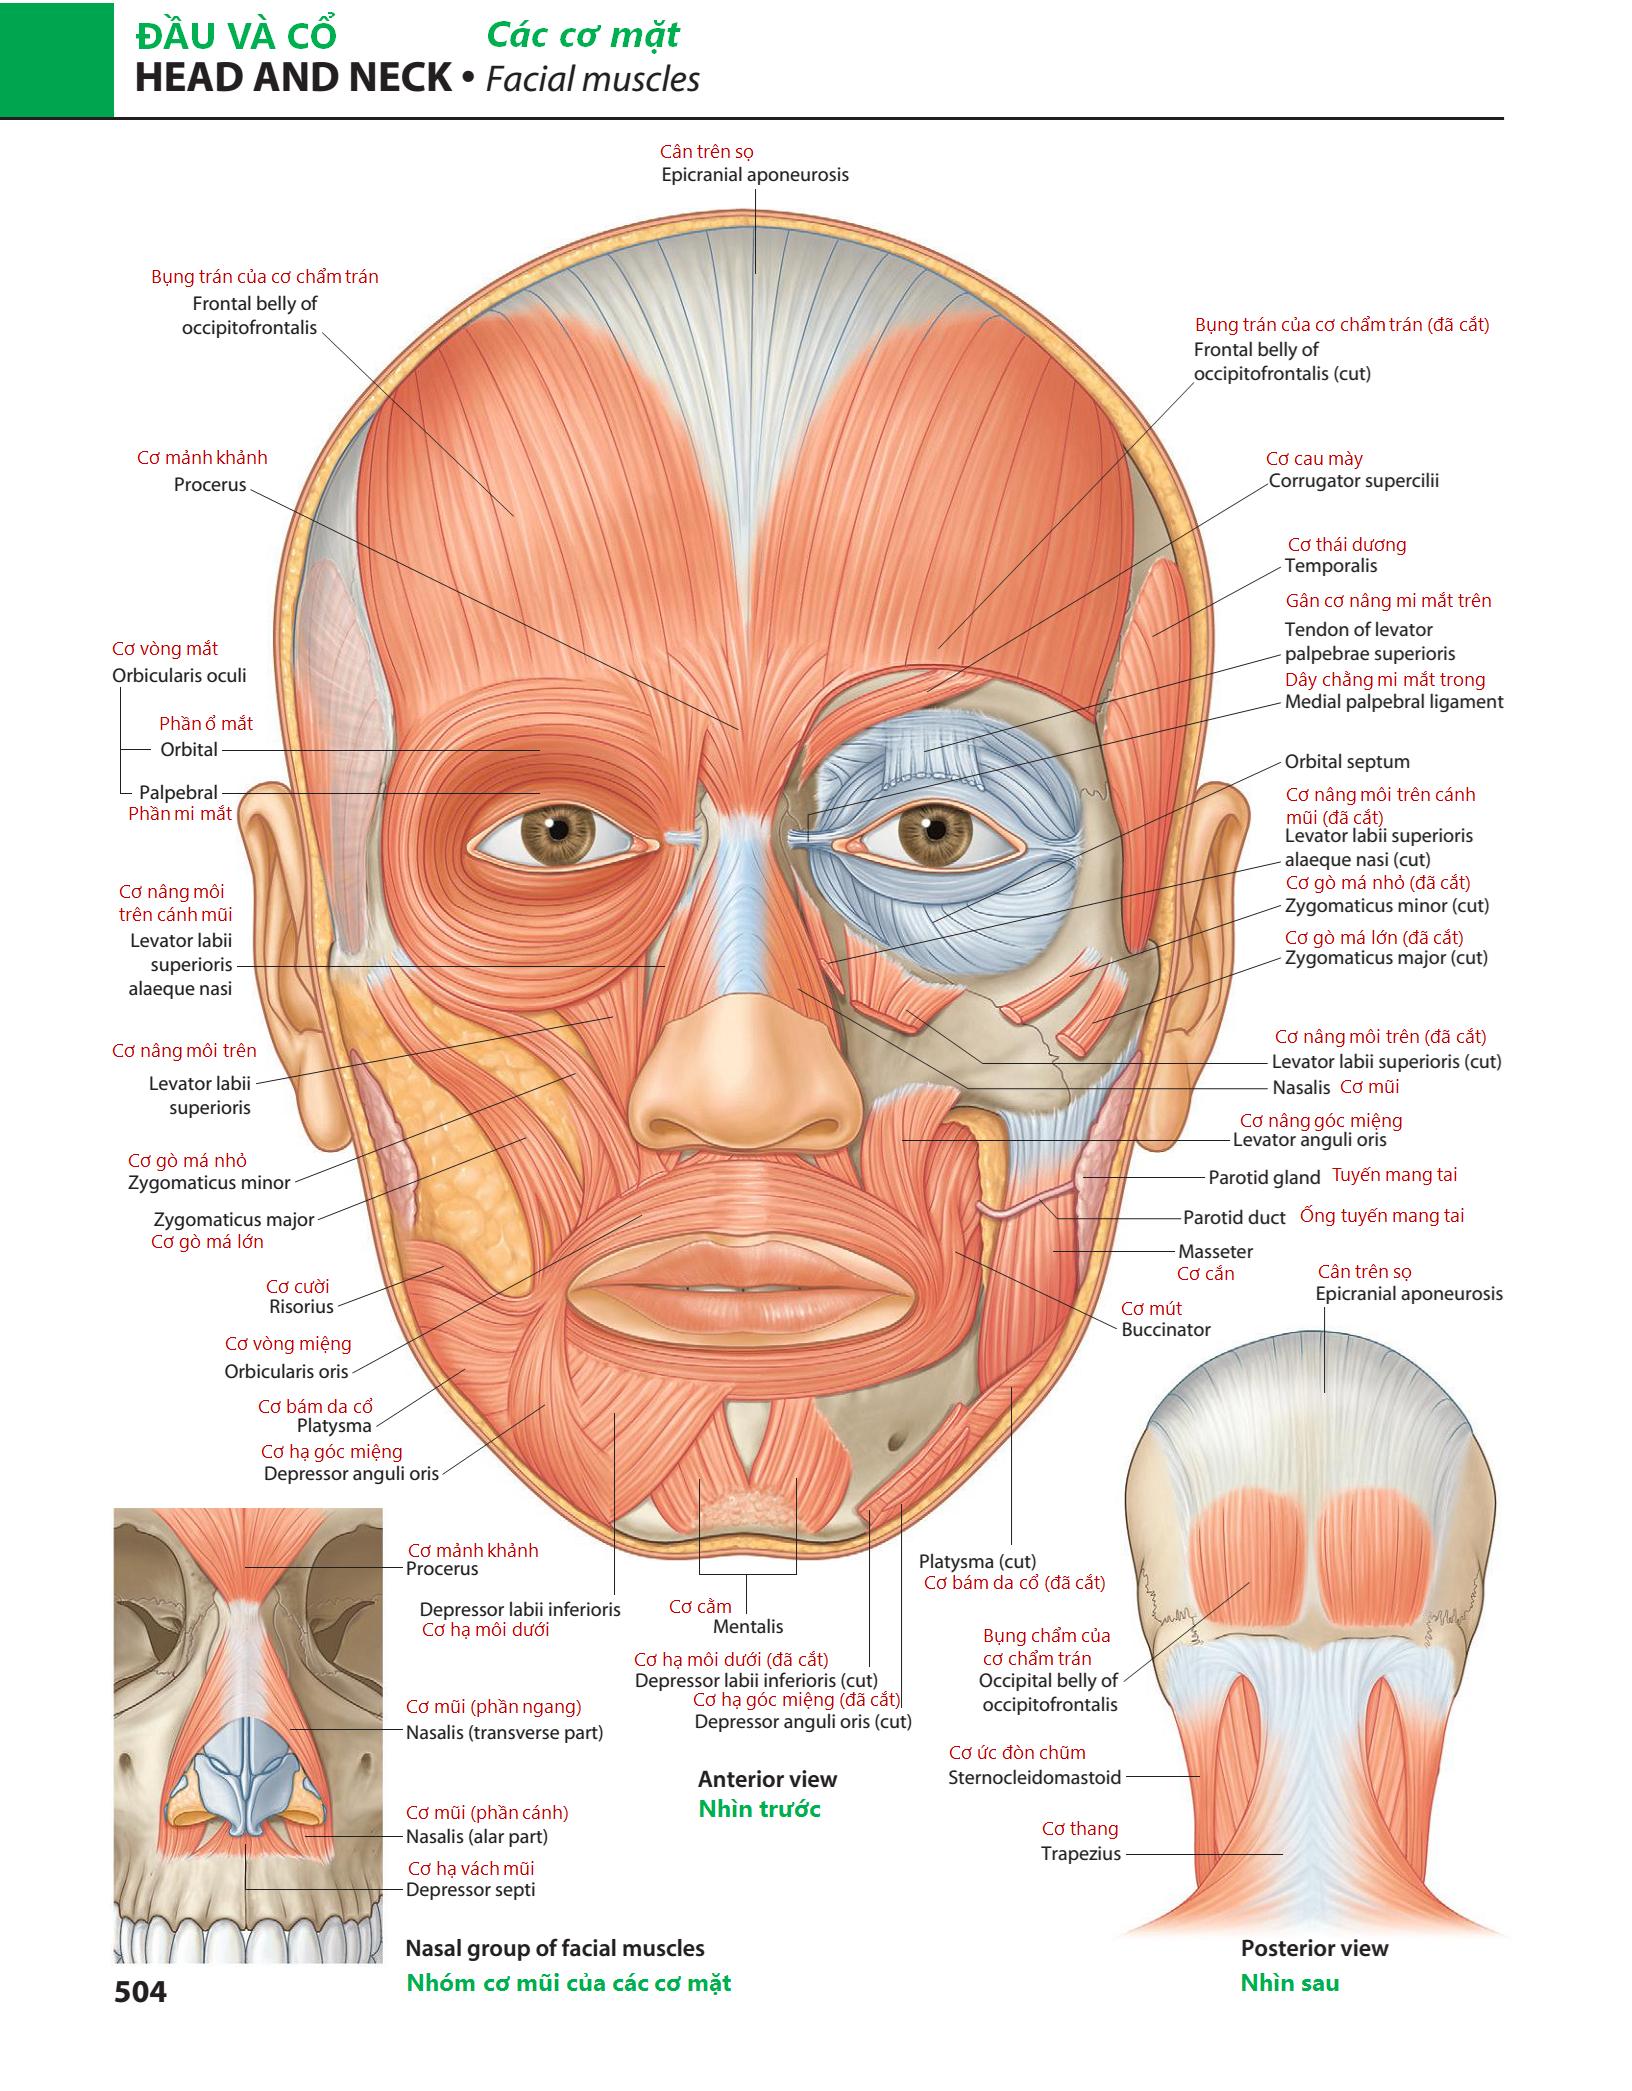 Richard L. Drake, A. Wayne Vogl, Adam W. M. Mitchell, Richard M. Tibbitts & Paul E. Richardson. Gray's Atlas of Anatomy, 2nd Edition. Churchill Livingstone, 2015: 504